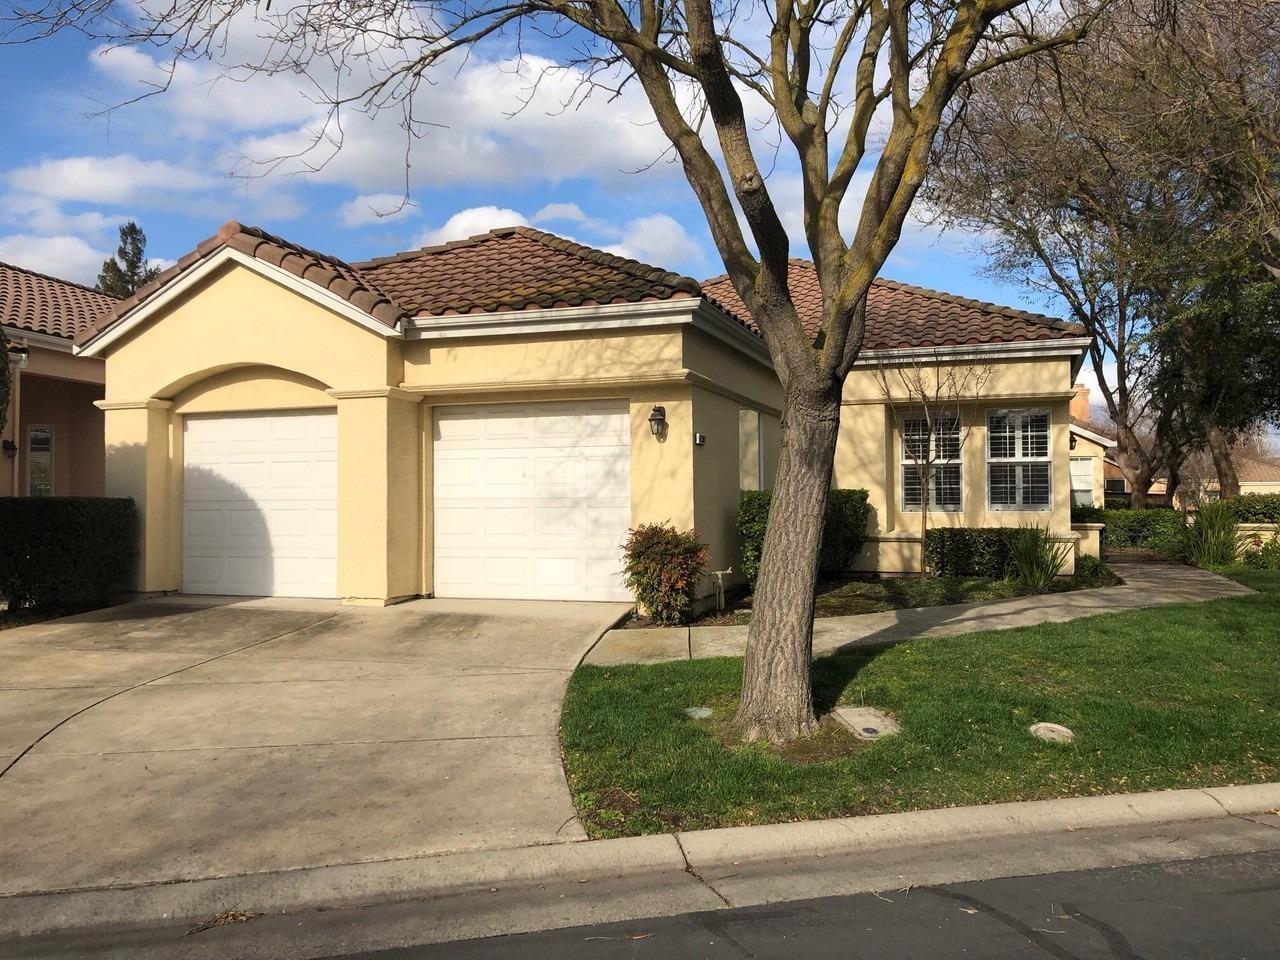 Photo of 4307 Heron Lakes Drive, Stockton, CA 95219